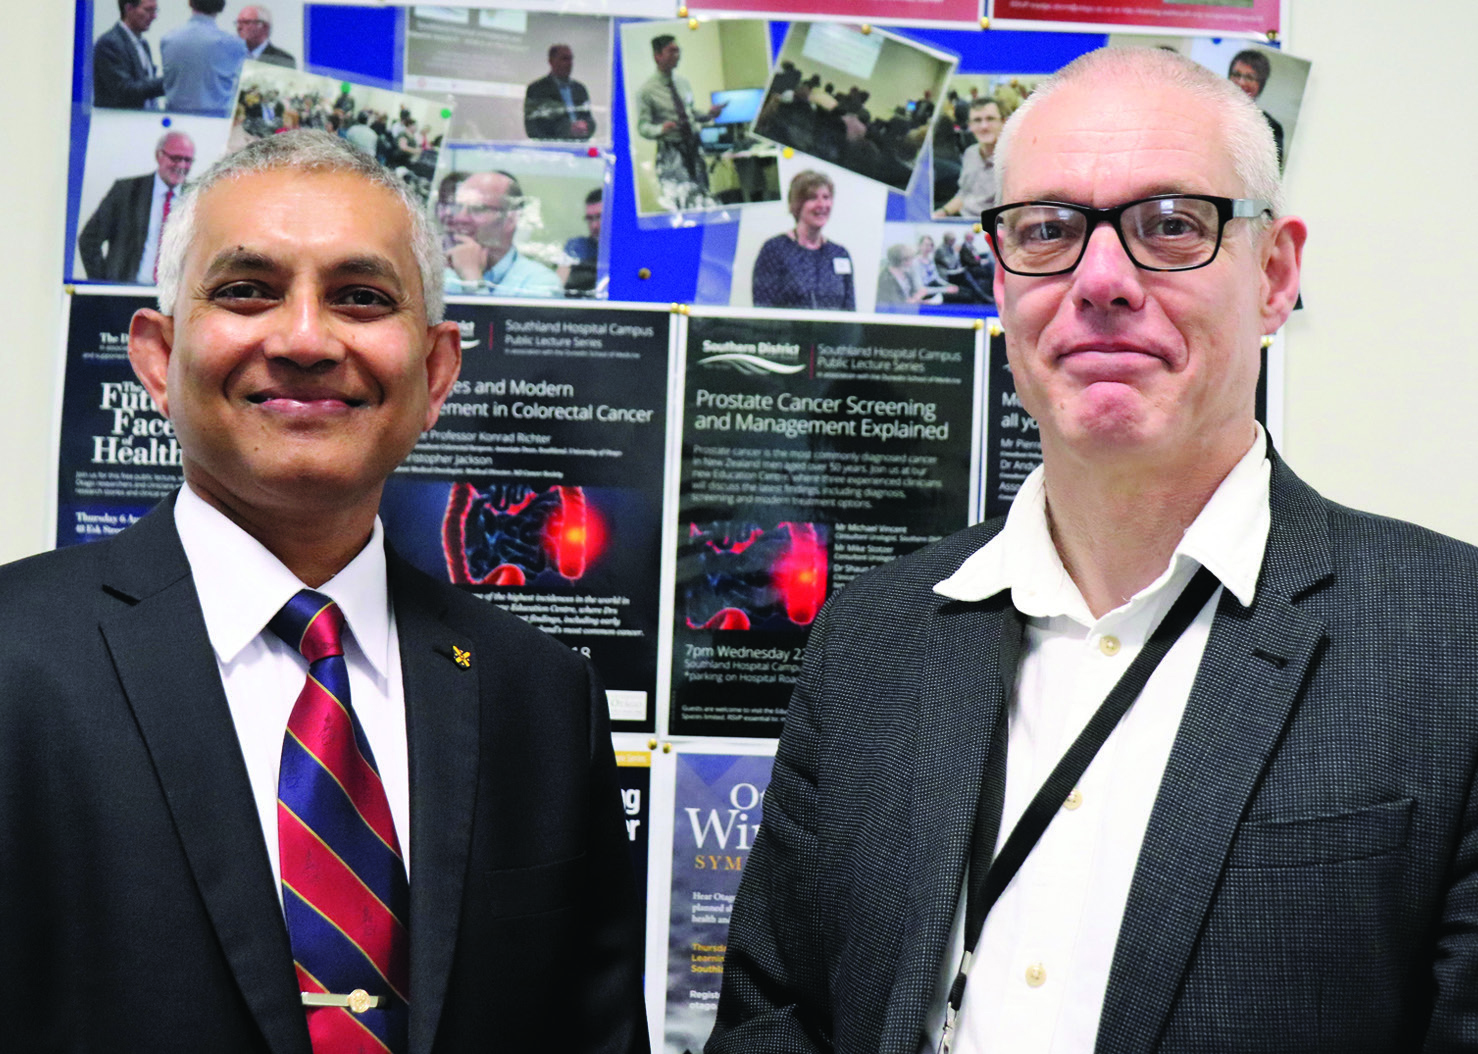 From left: Dean of Otago Medical School Professor Rathan Subramaniam with Associate Professor...